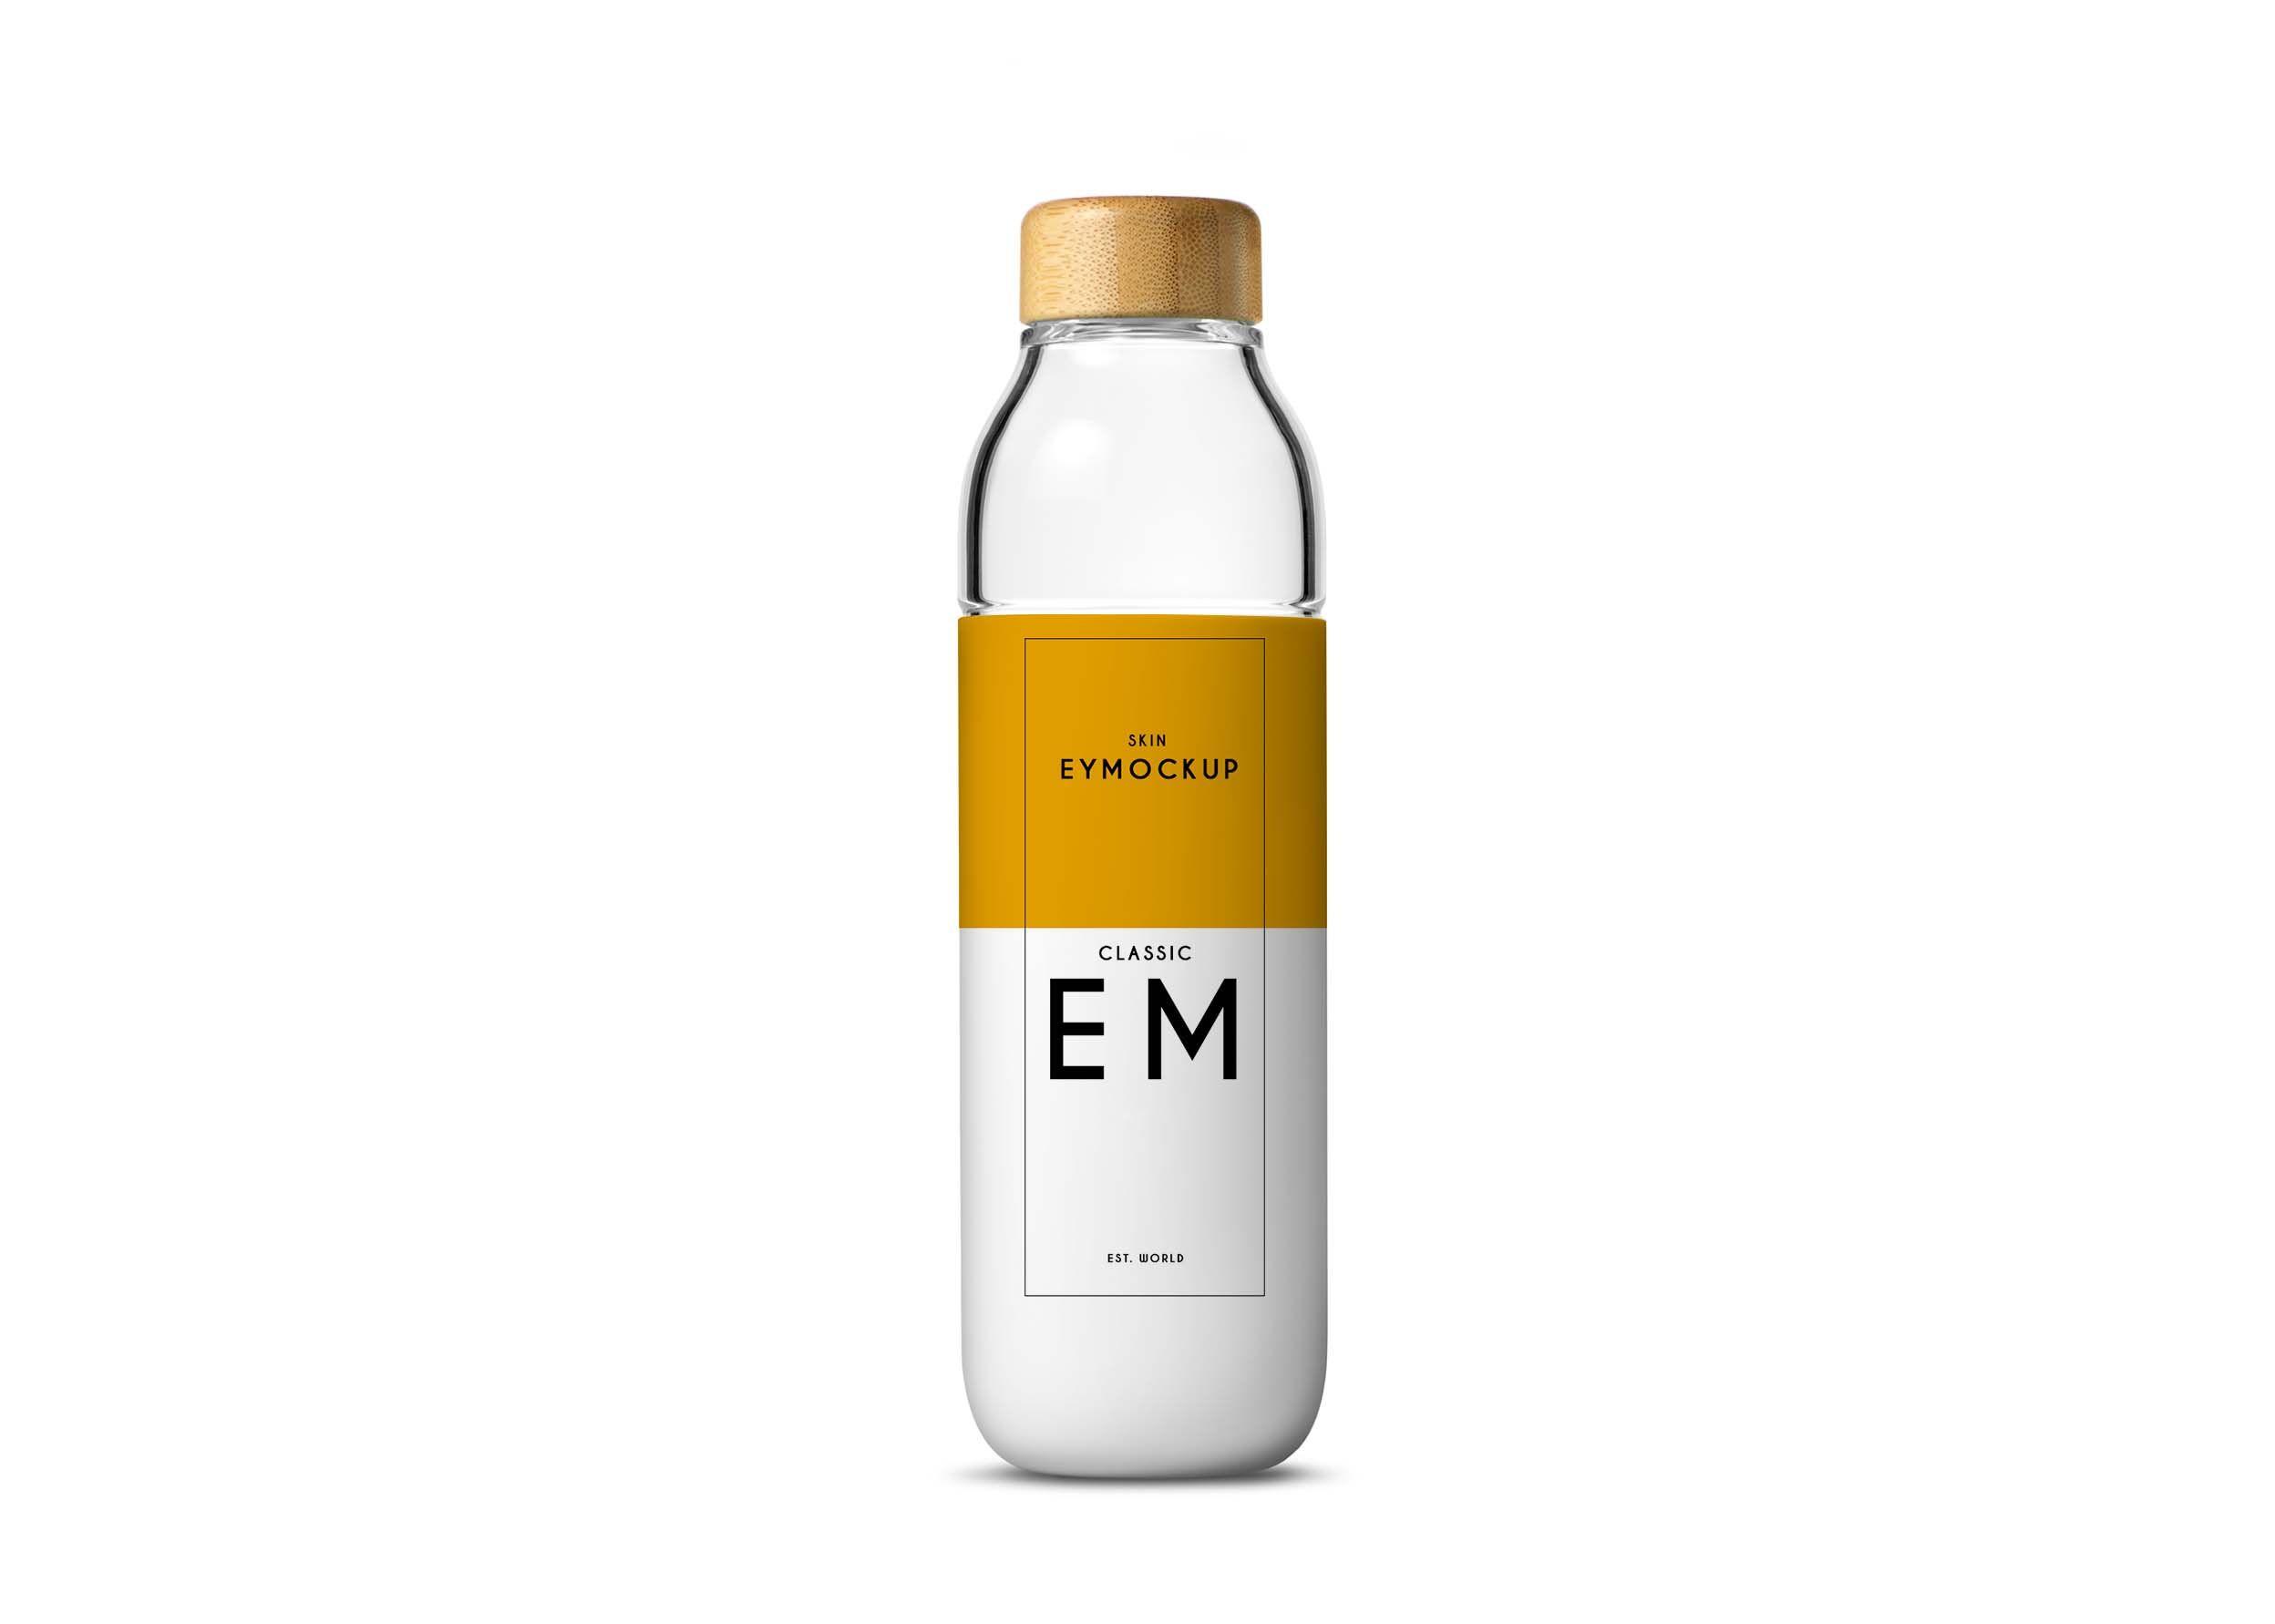 Download New Mineral Water Bottle Label Mockup Bottle Mockup Bottle Mockup Free Psd